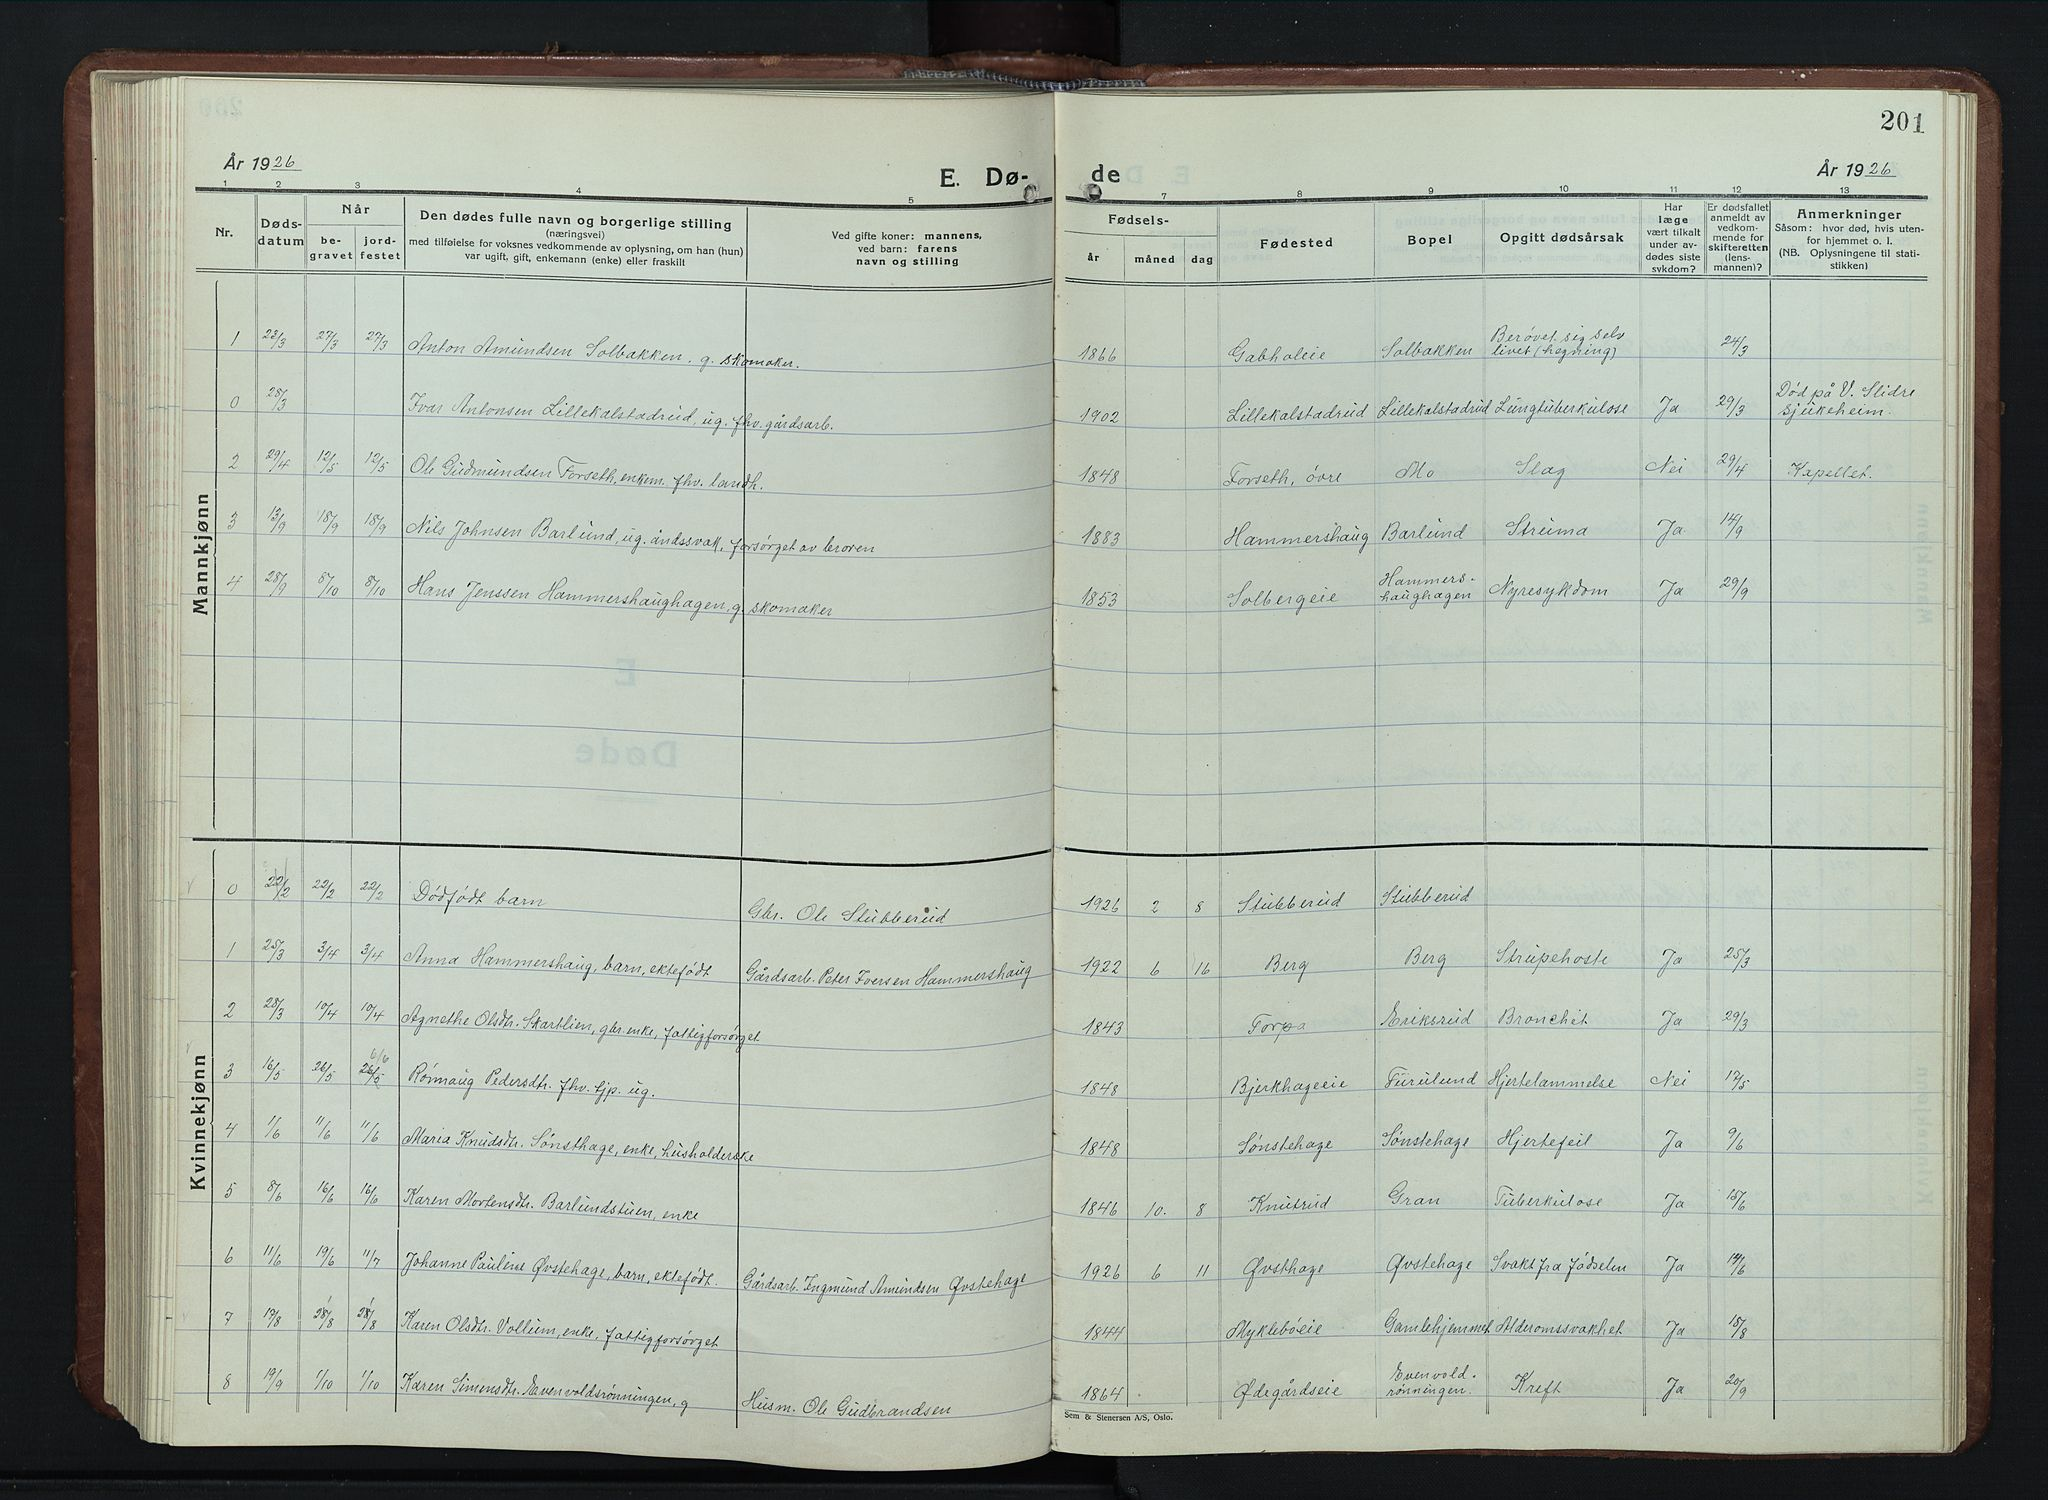 SAH, Vestre Gausdal prestekontor, Klokkerbok nr. 5, 1926-1955, s. 201